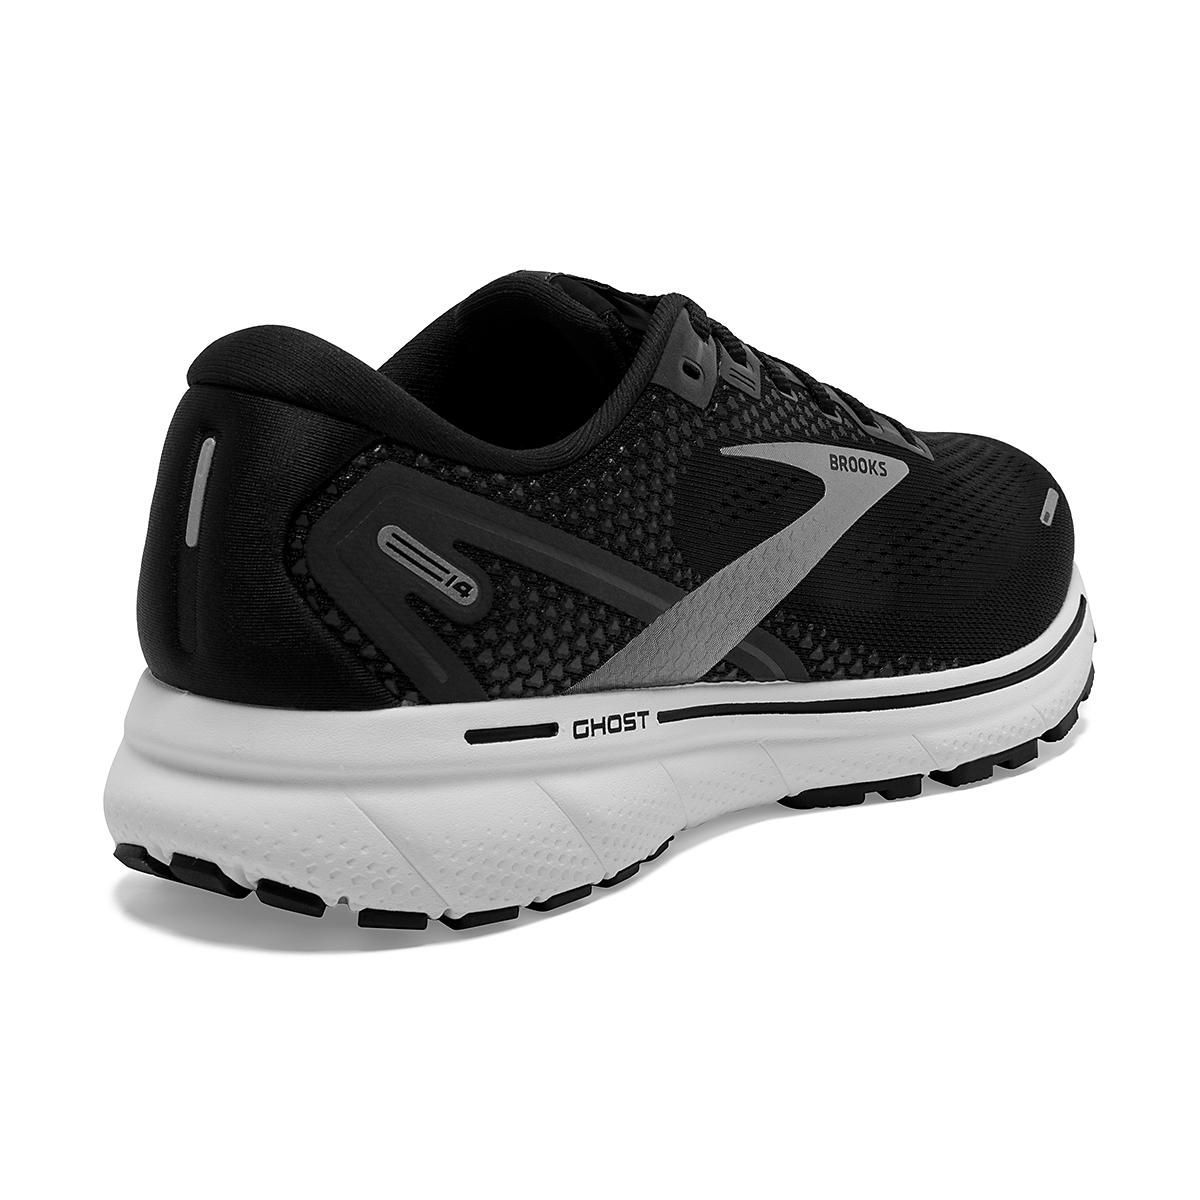 Men's Brooks Ghost 14 Running Shoe - Color: Black/White - Size: 7 - Width: Regular, Black/White, large, image 3